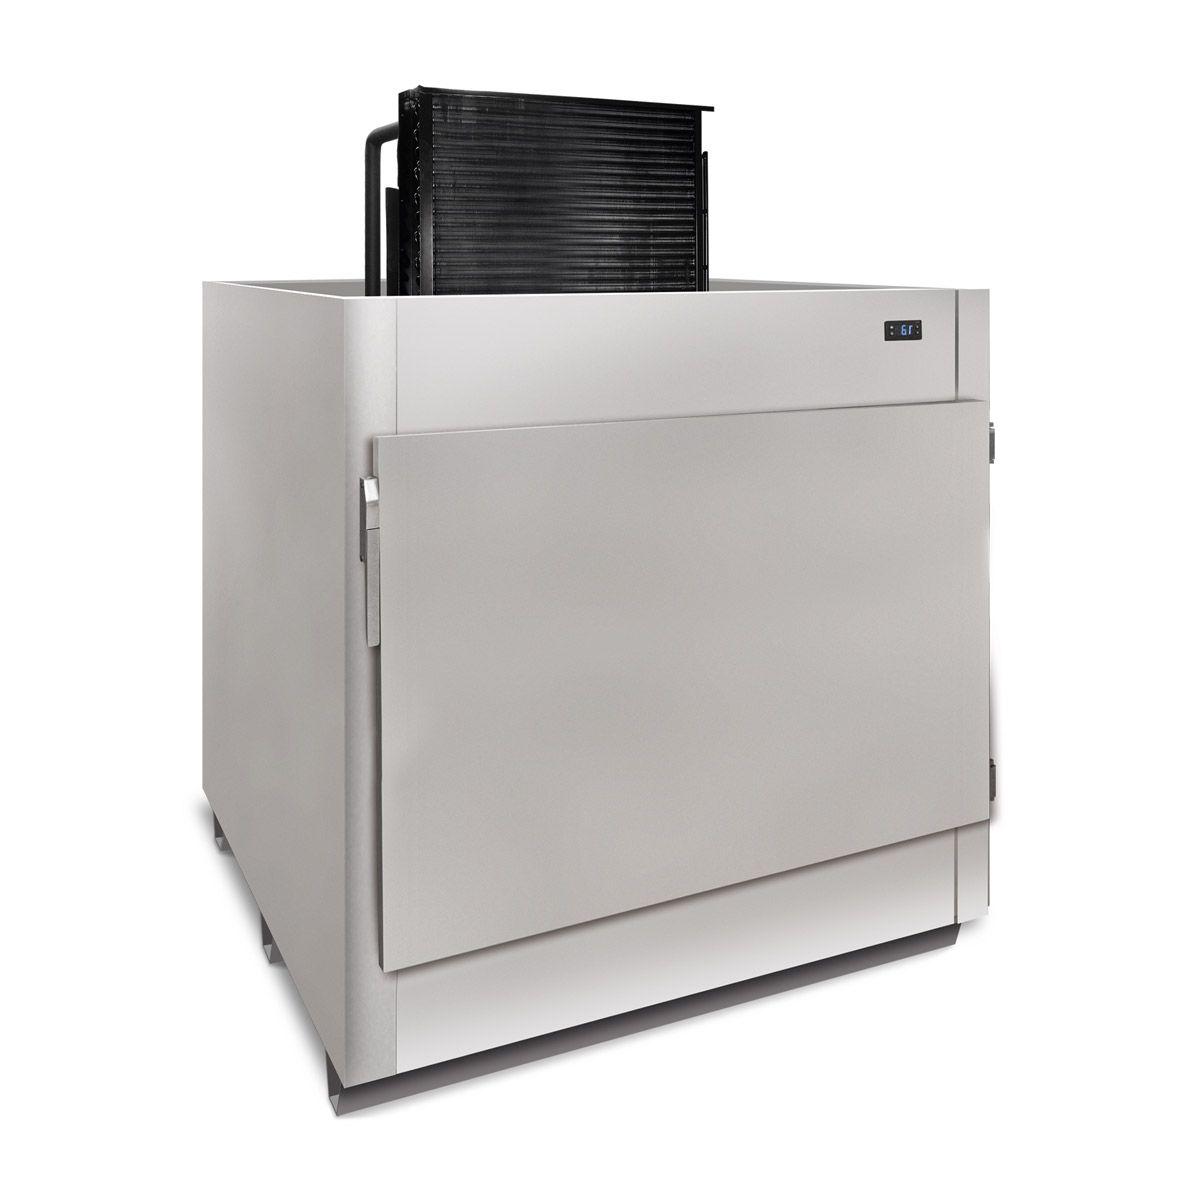 Fabricador de gelo 35 barras